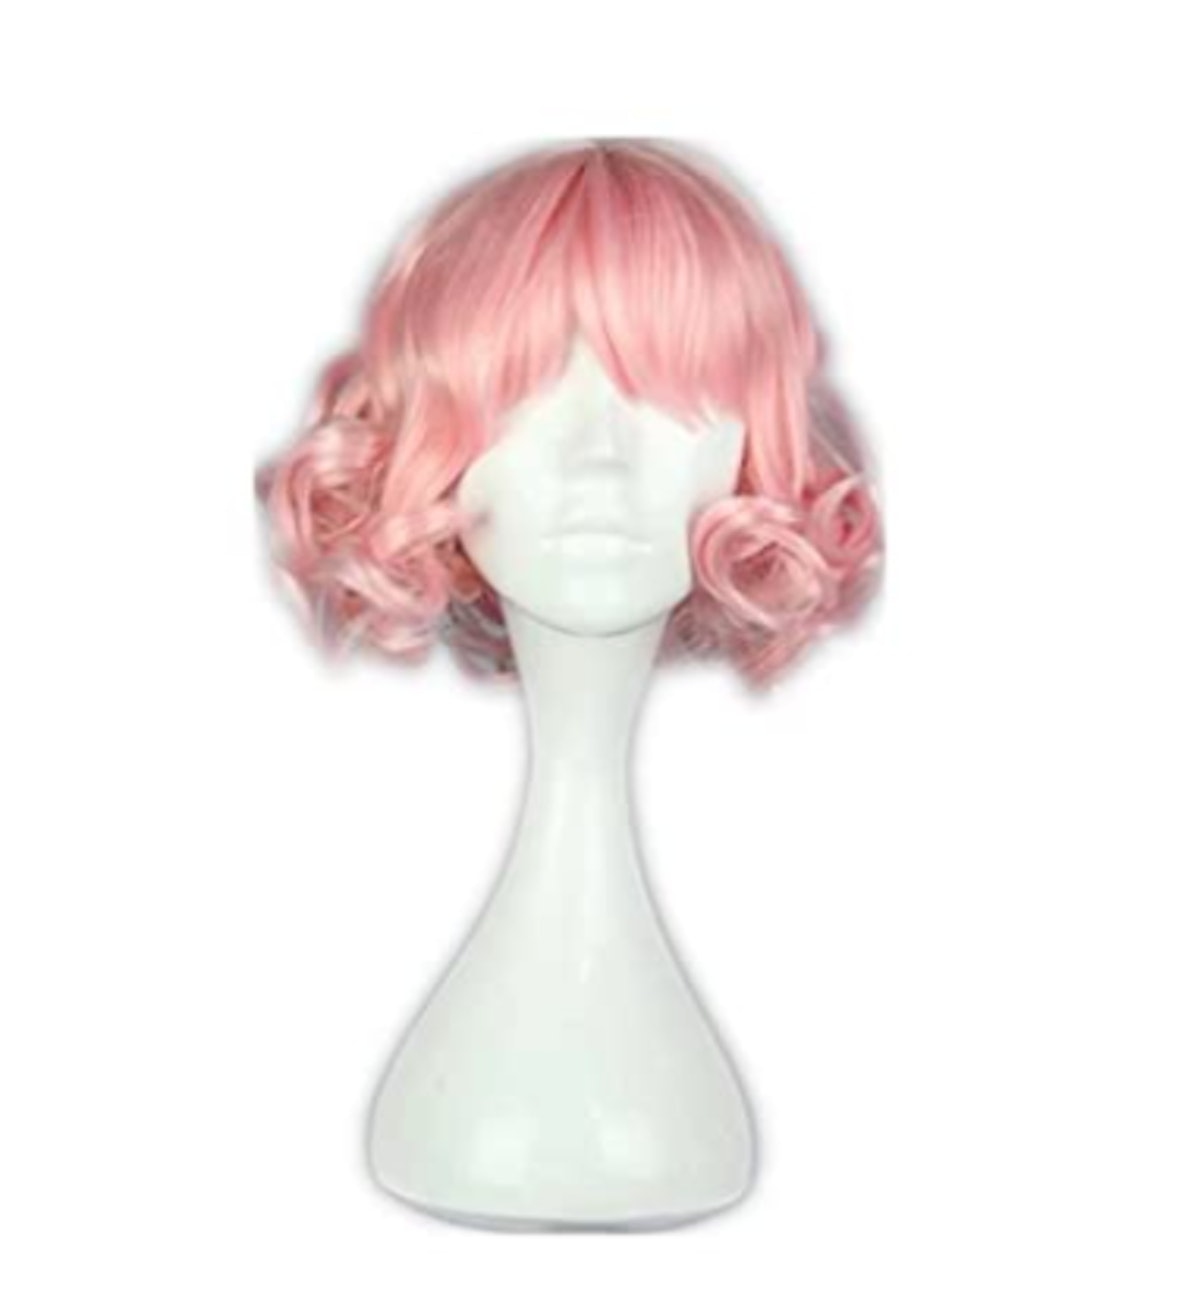 Cosplay Wigs Costume Hair In Pastel Pink